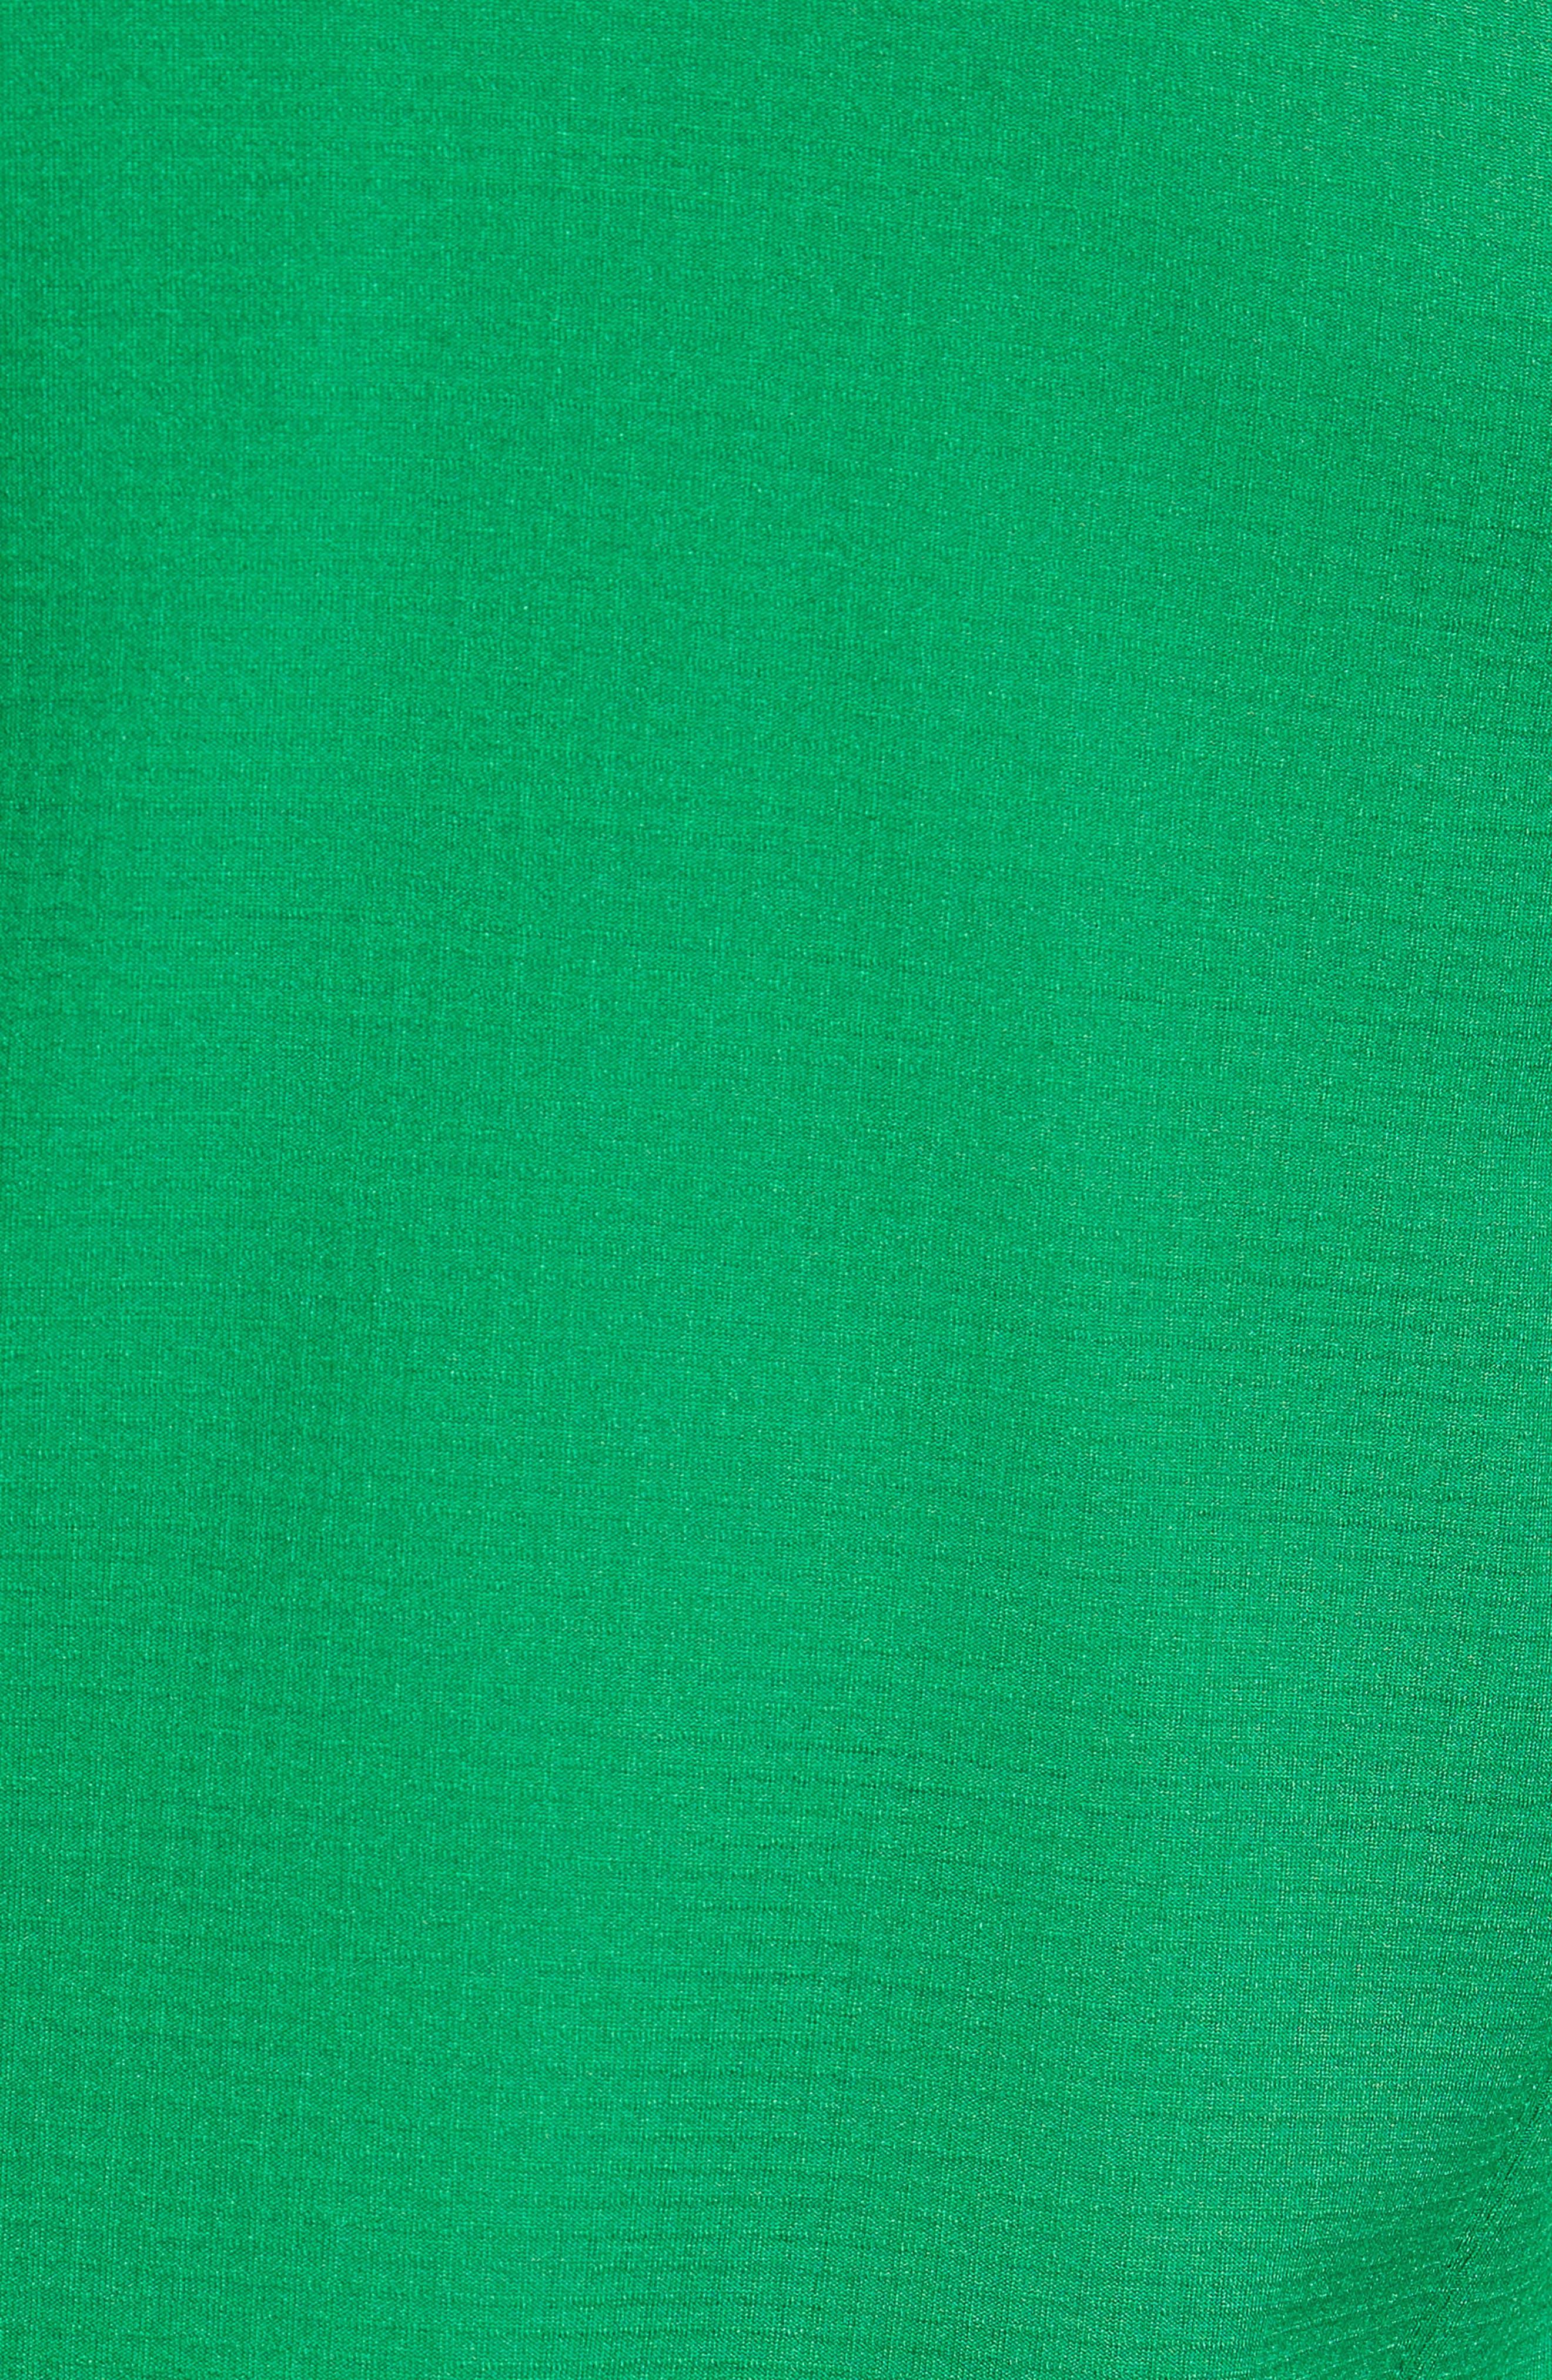 Borod Zip Fleece Jacket,                             Alternate thumbnail 5, color,                             PRIMARY GREEN/GARDEN GREEN